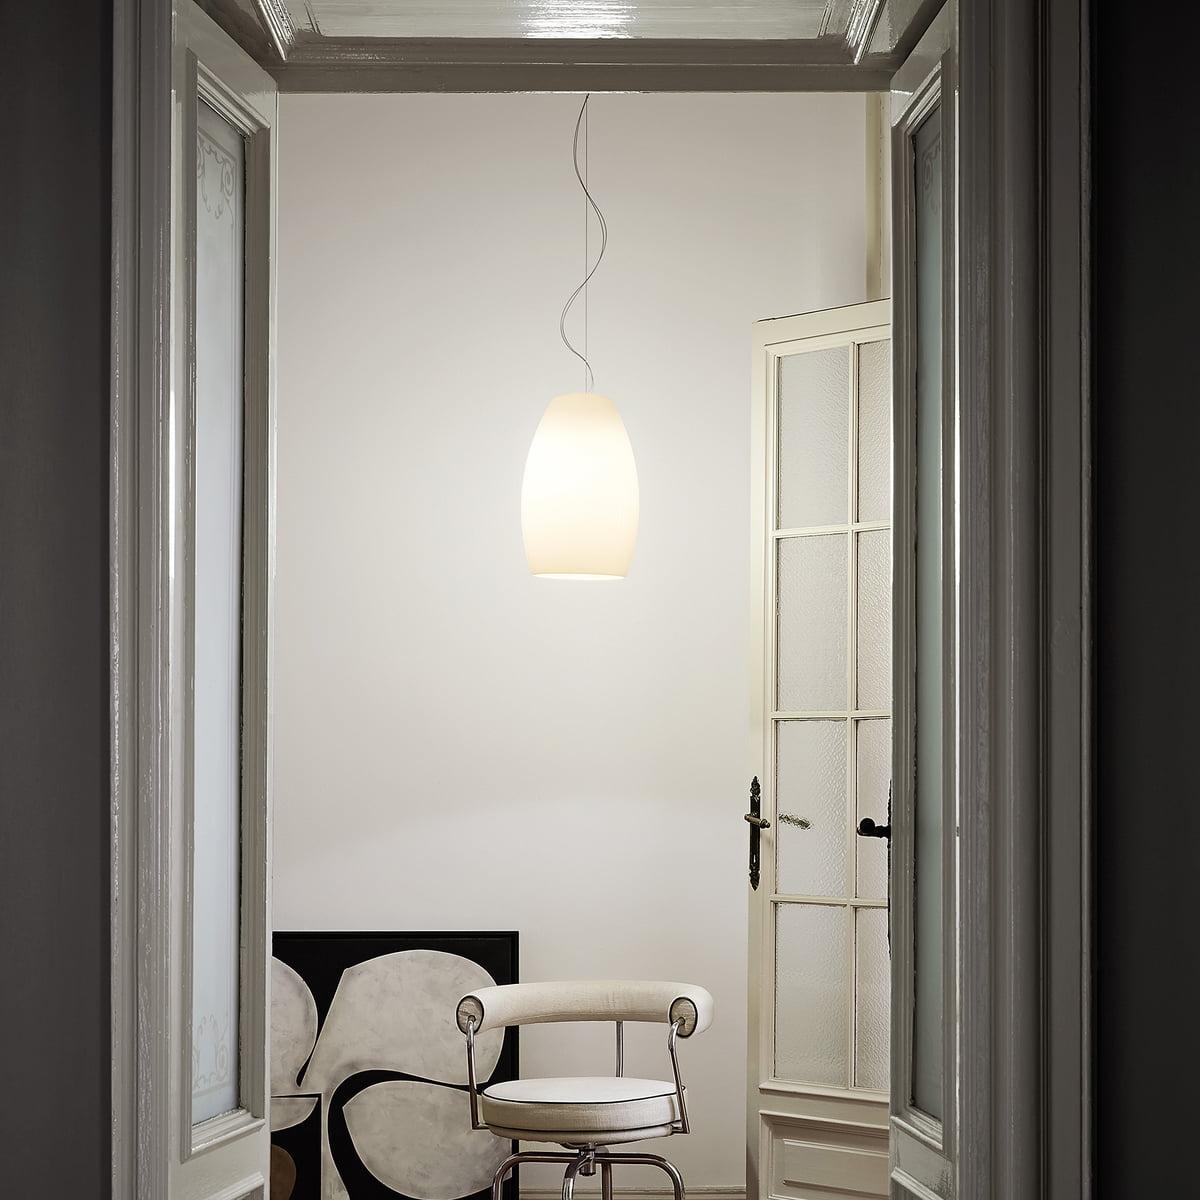 Attractive The Foscarini Buds 1 Pendant Lamp